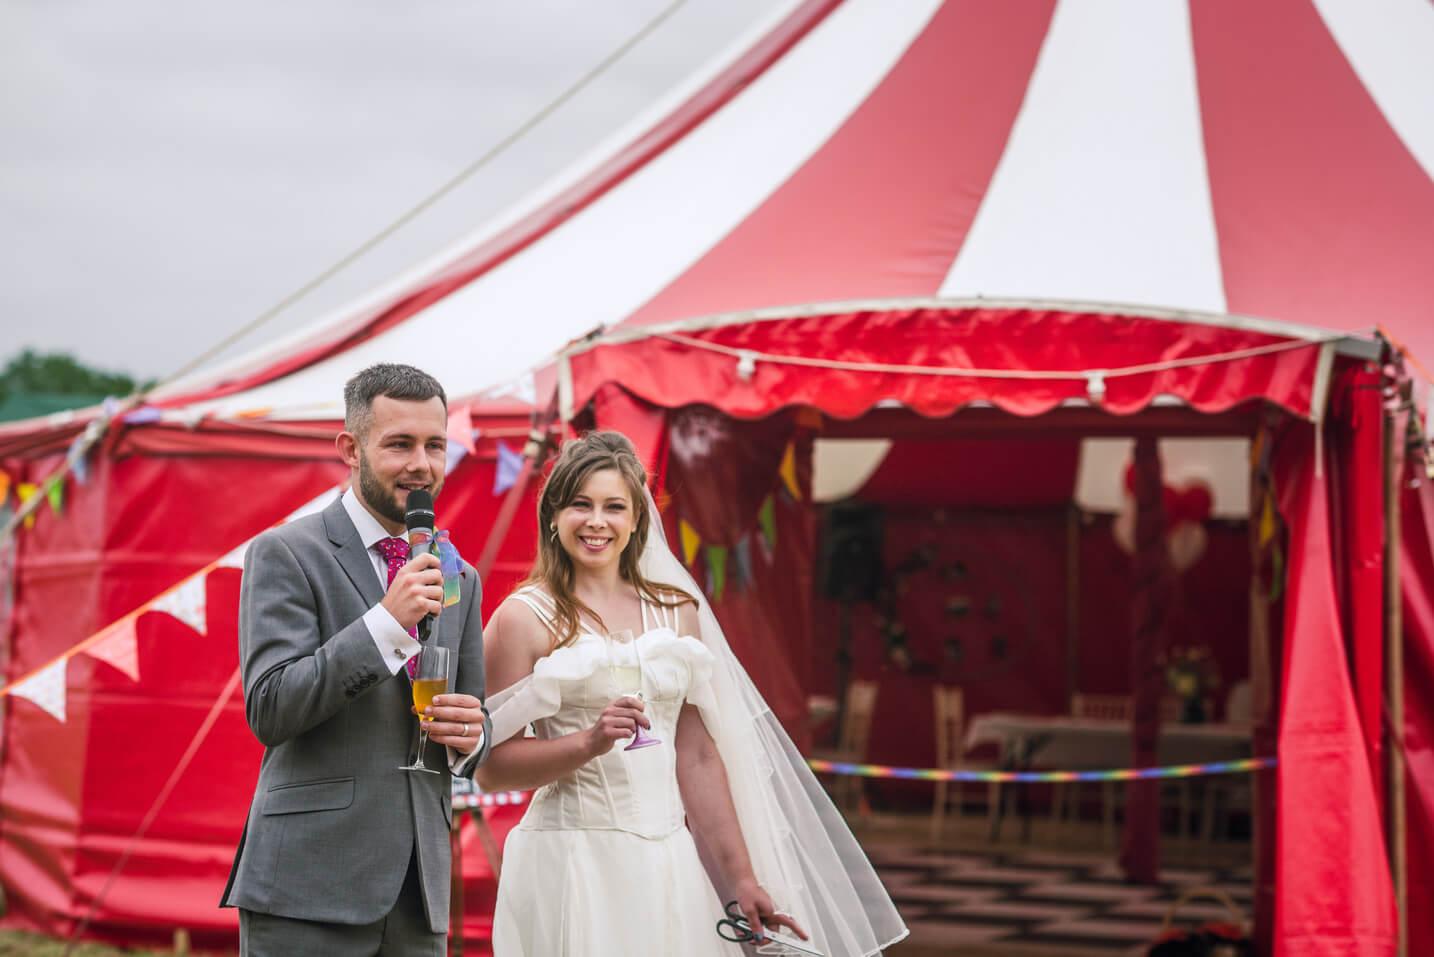 Big Top wedding tent